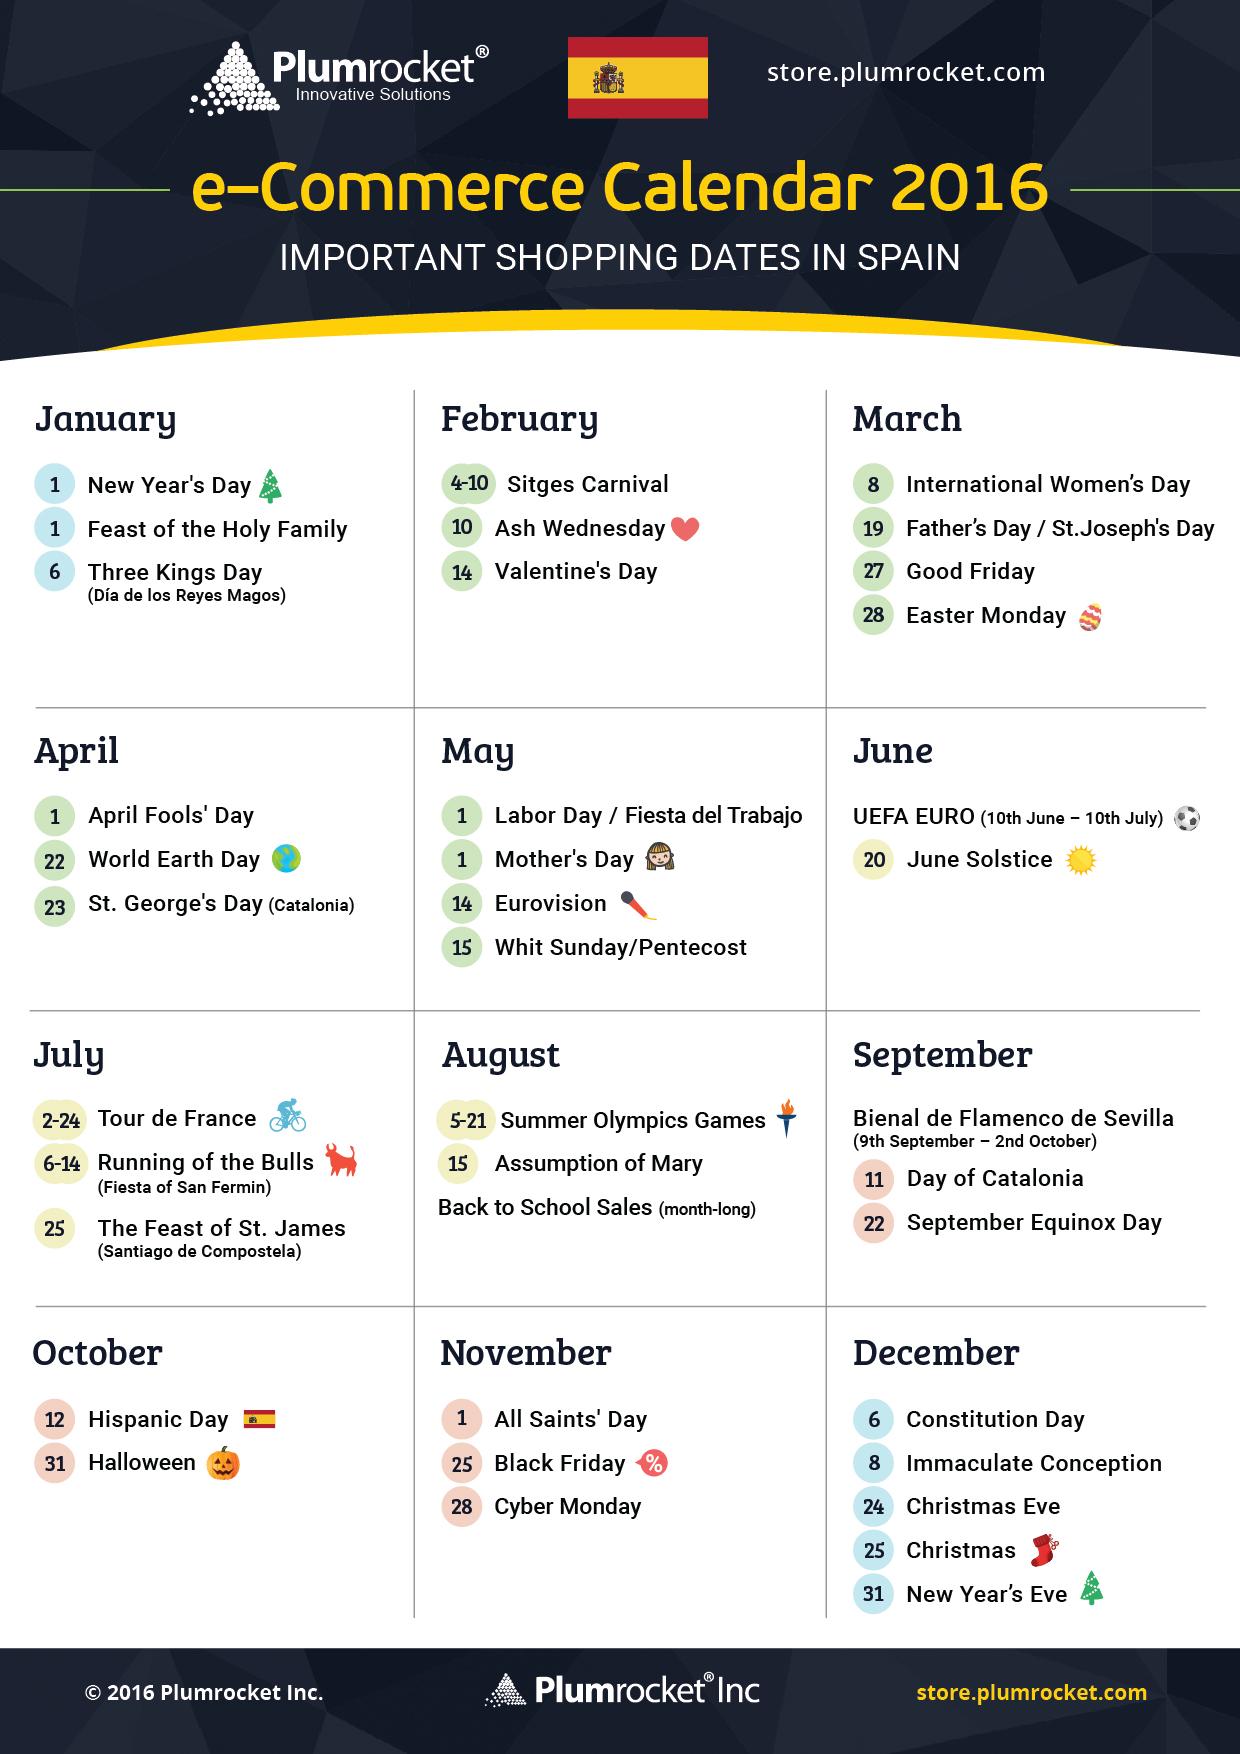 ecommerce-calendar-spain-2016-by-Plumrocket